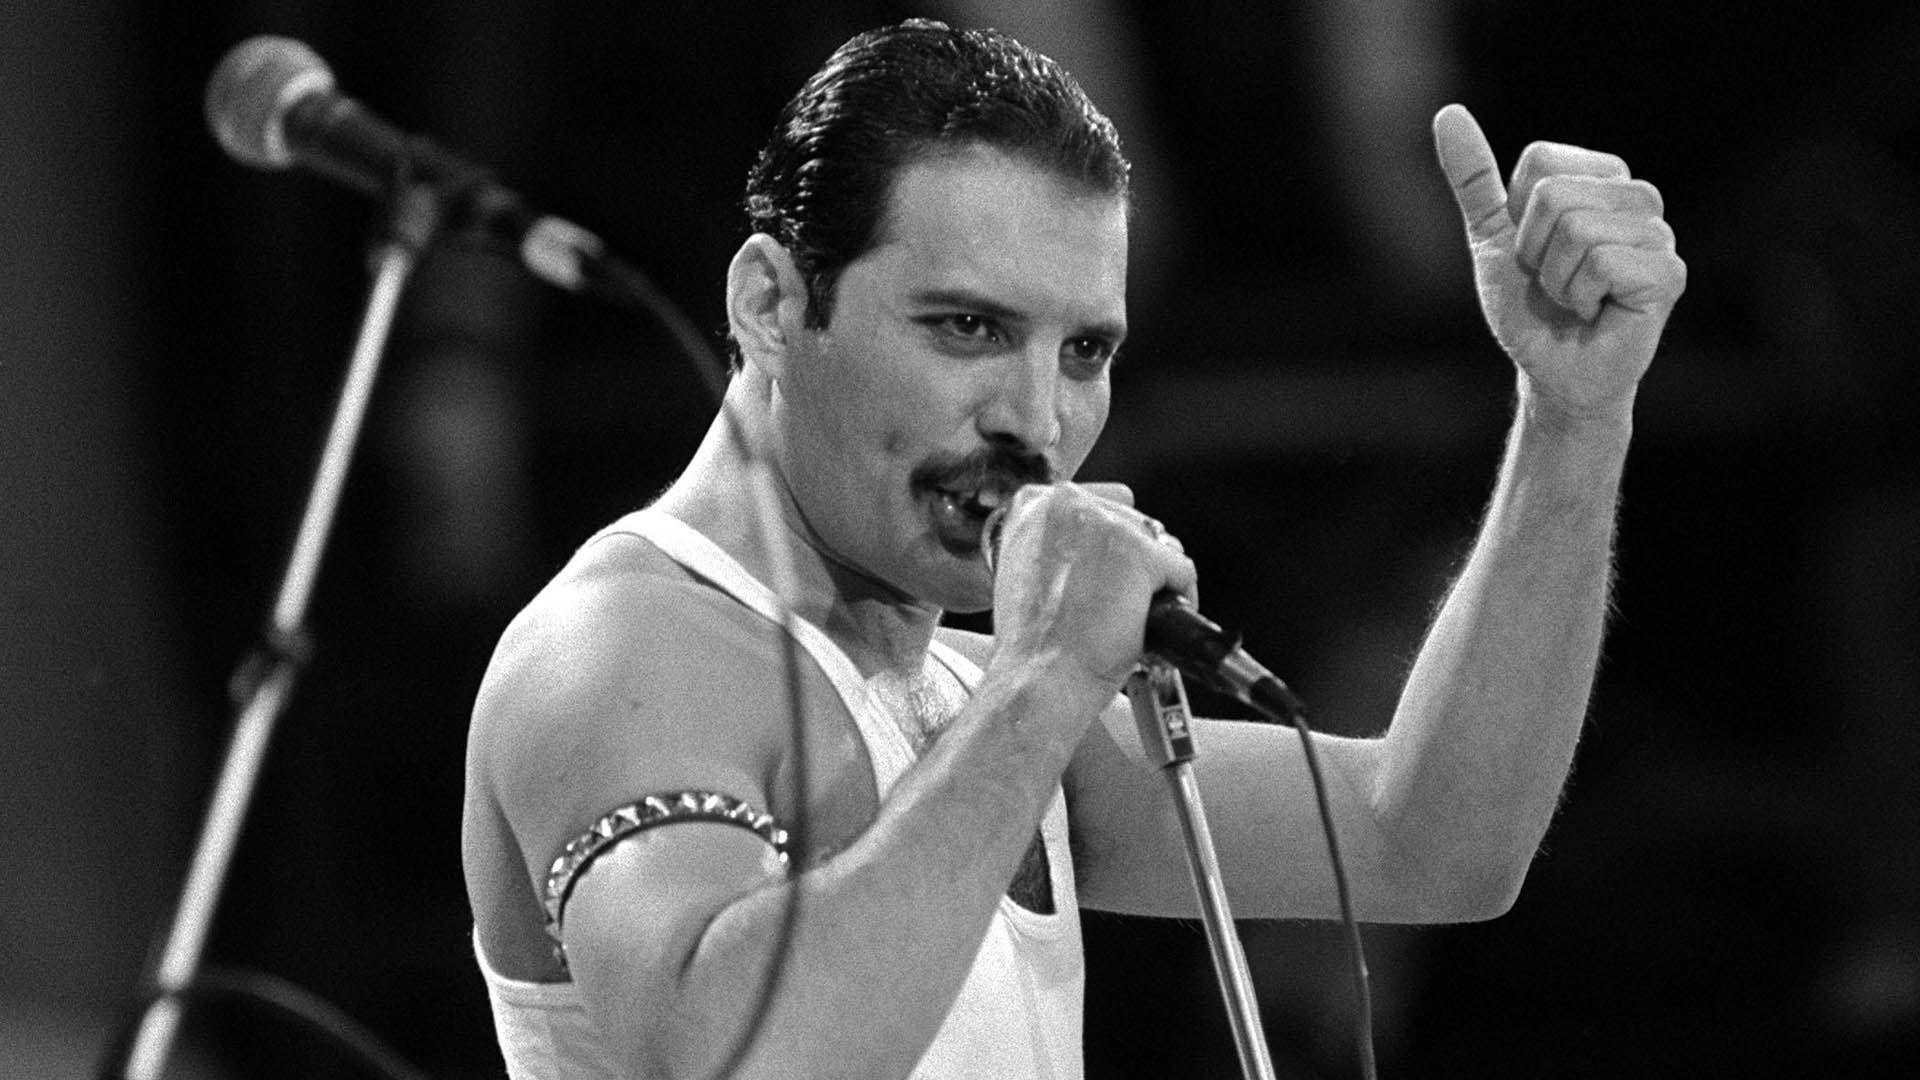 6. Freddie Mercury